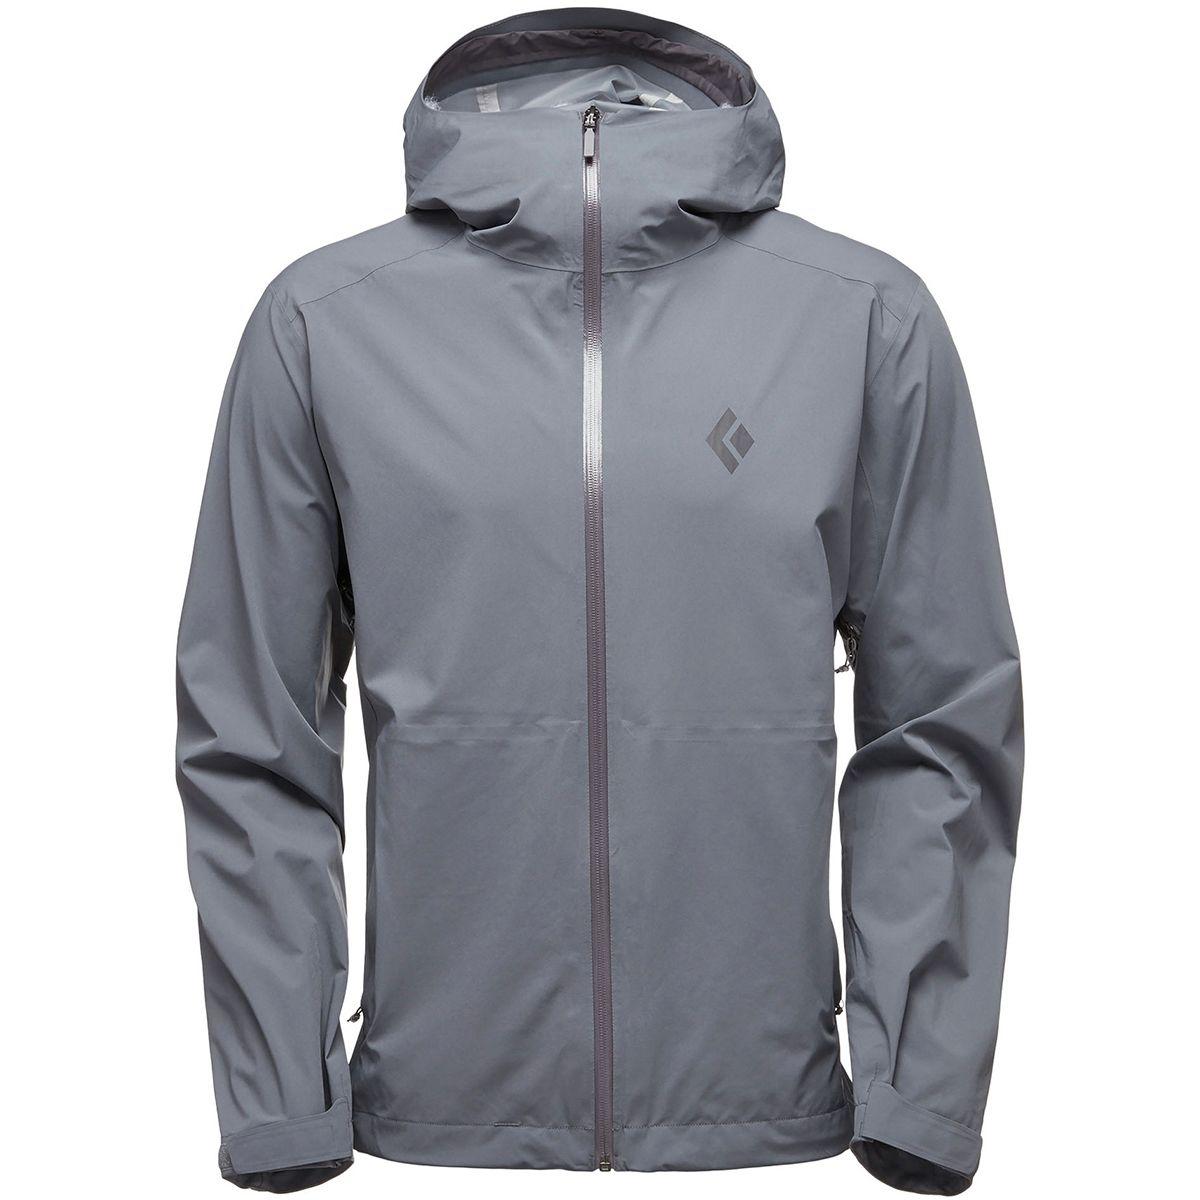 Stormline Stretch Rain Shell Jacket - Men